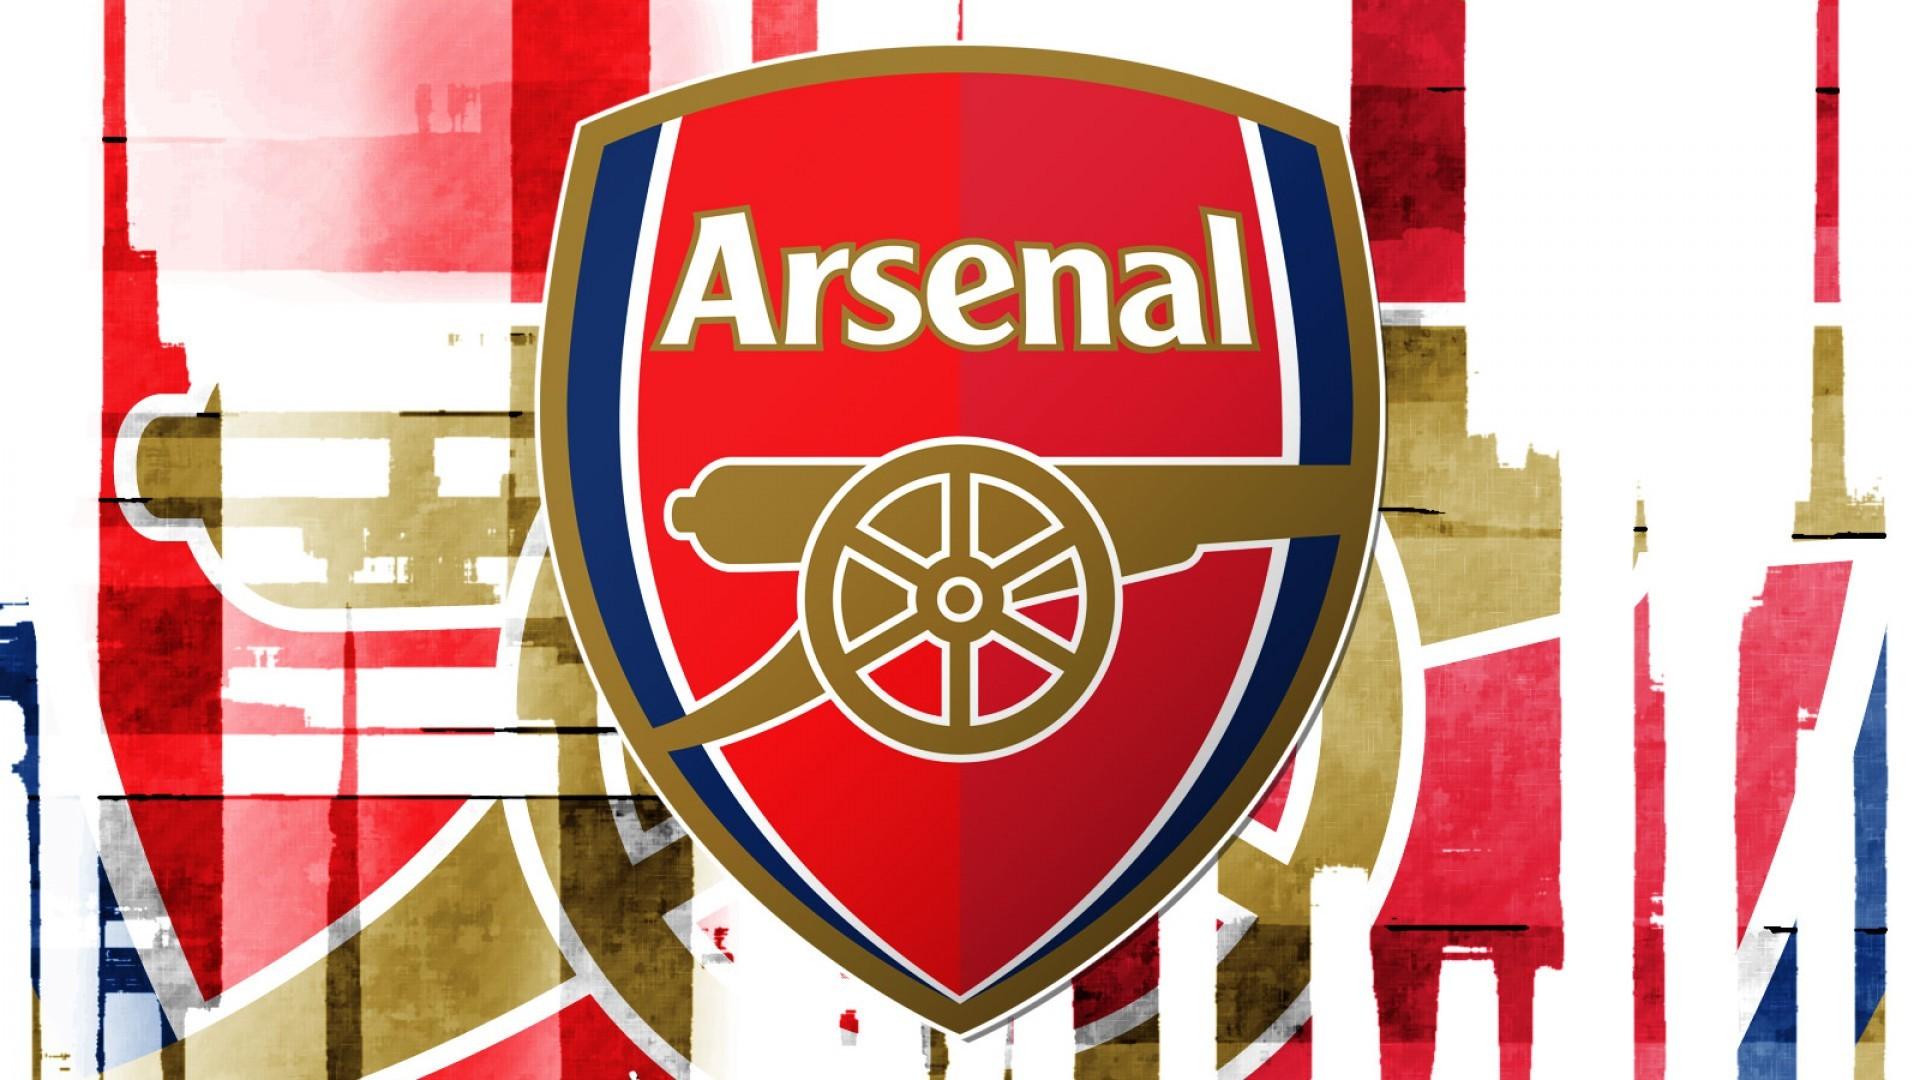 Arsenal FC - 1920x1080